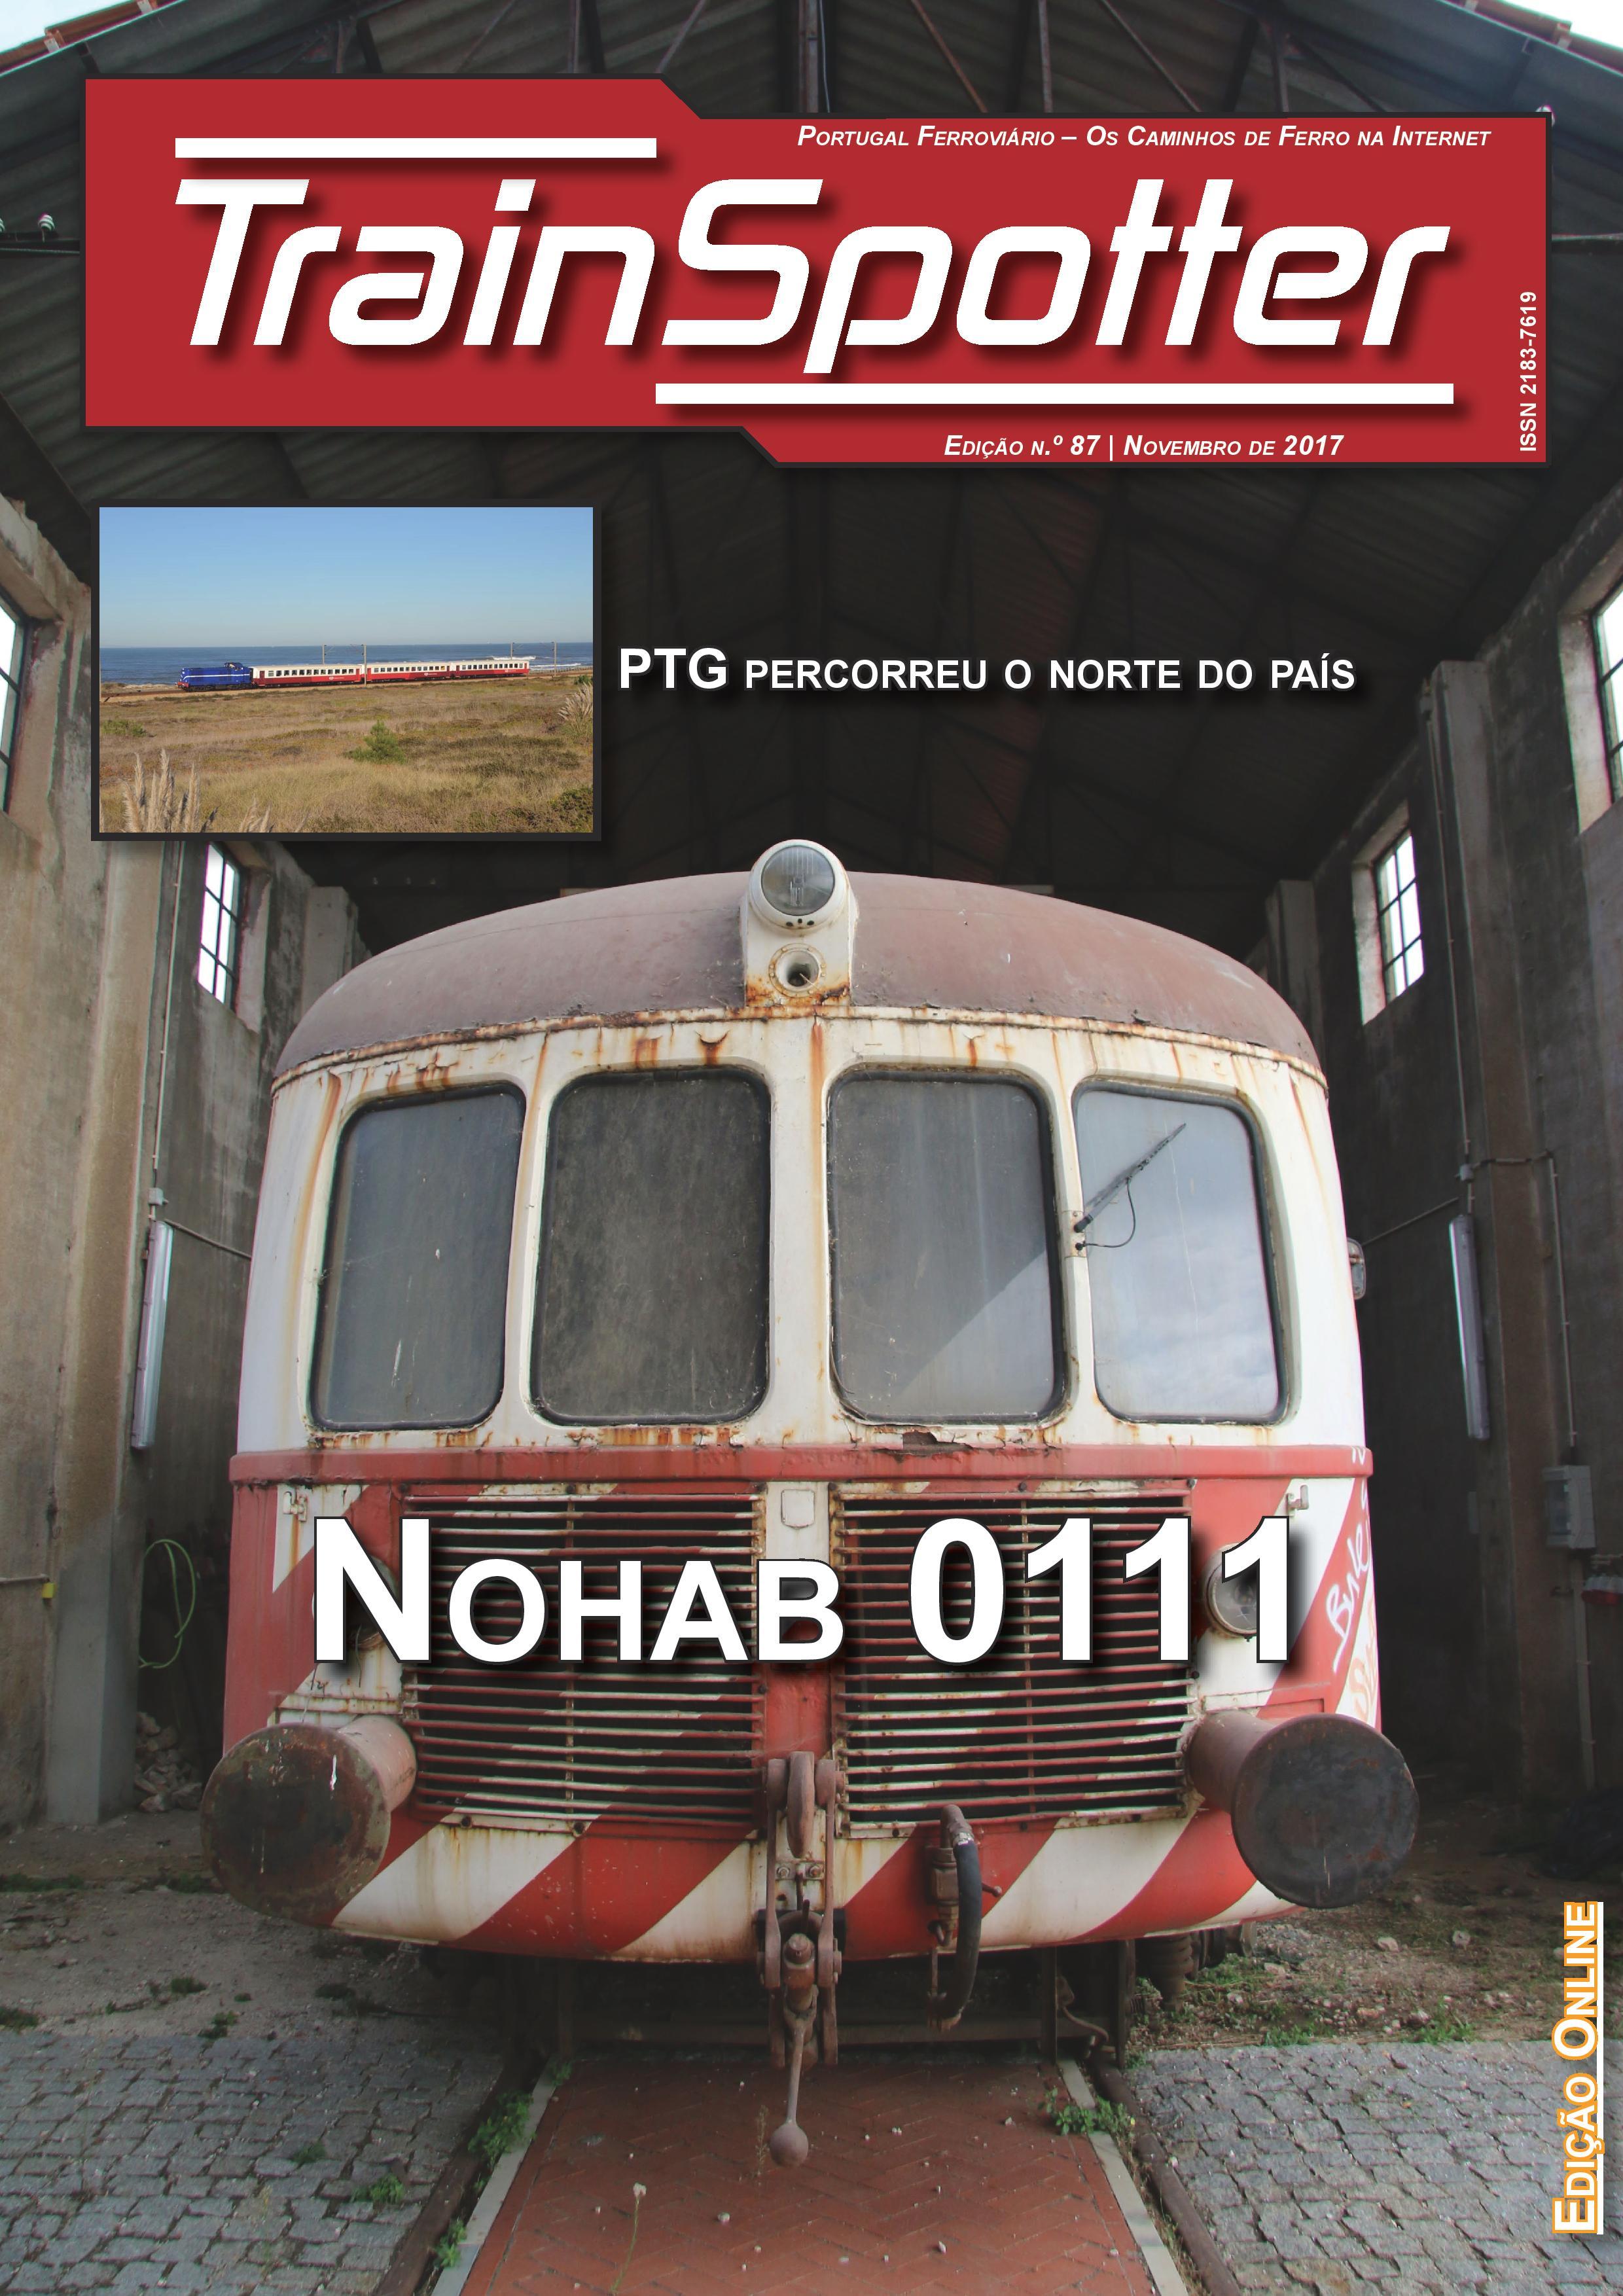 Trainspotter nº 087 – Novembro de 2017